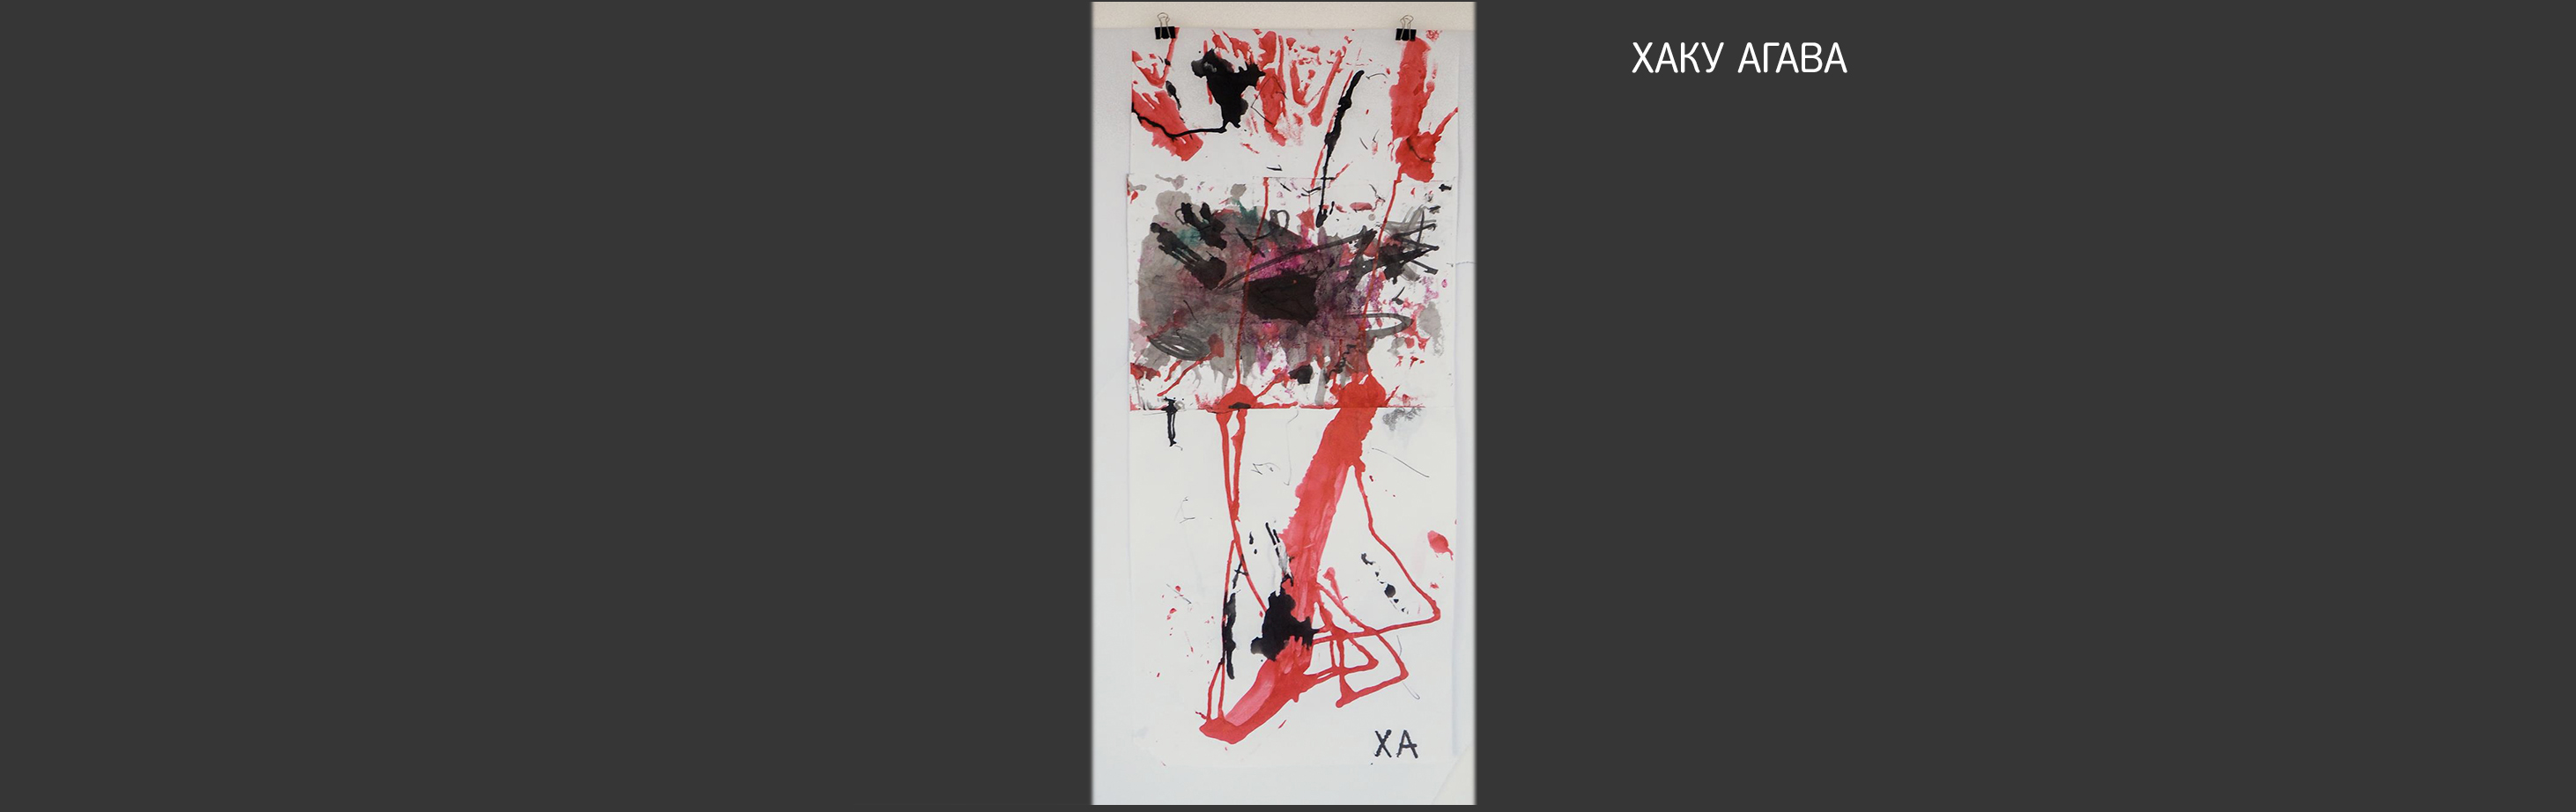 Х А банер-01